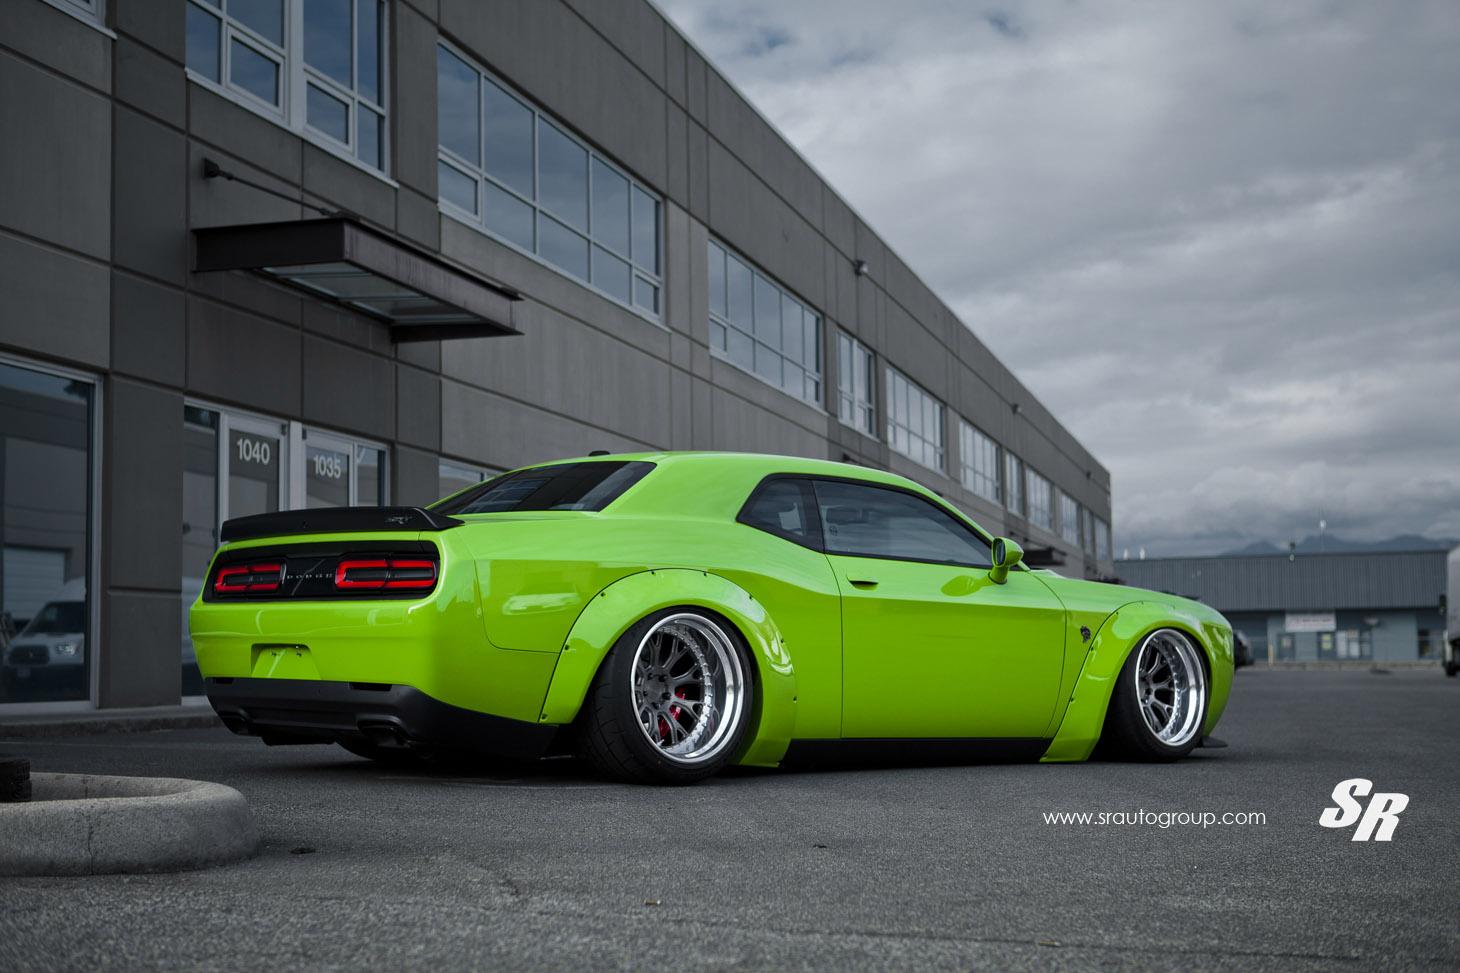 2015 Liberty Walk Dodge Challenger Hellcat Green